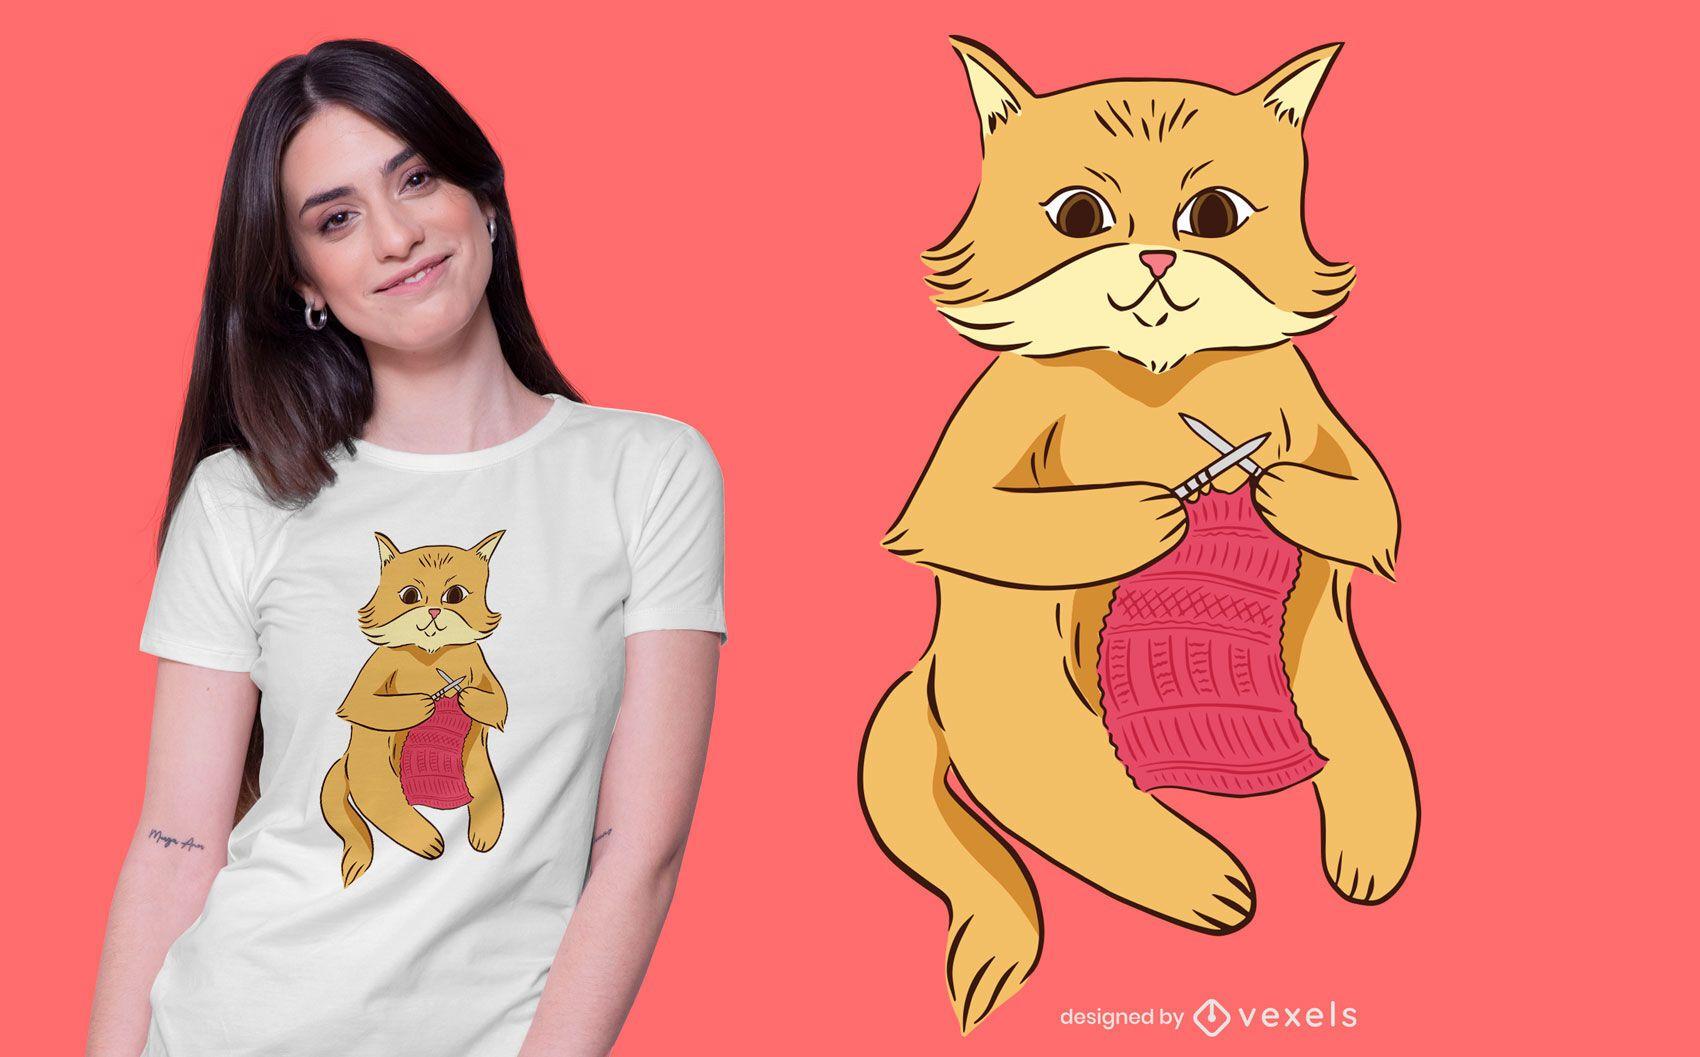 Knitting cat t-shirt design